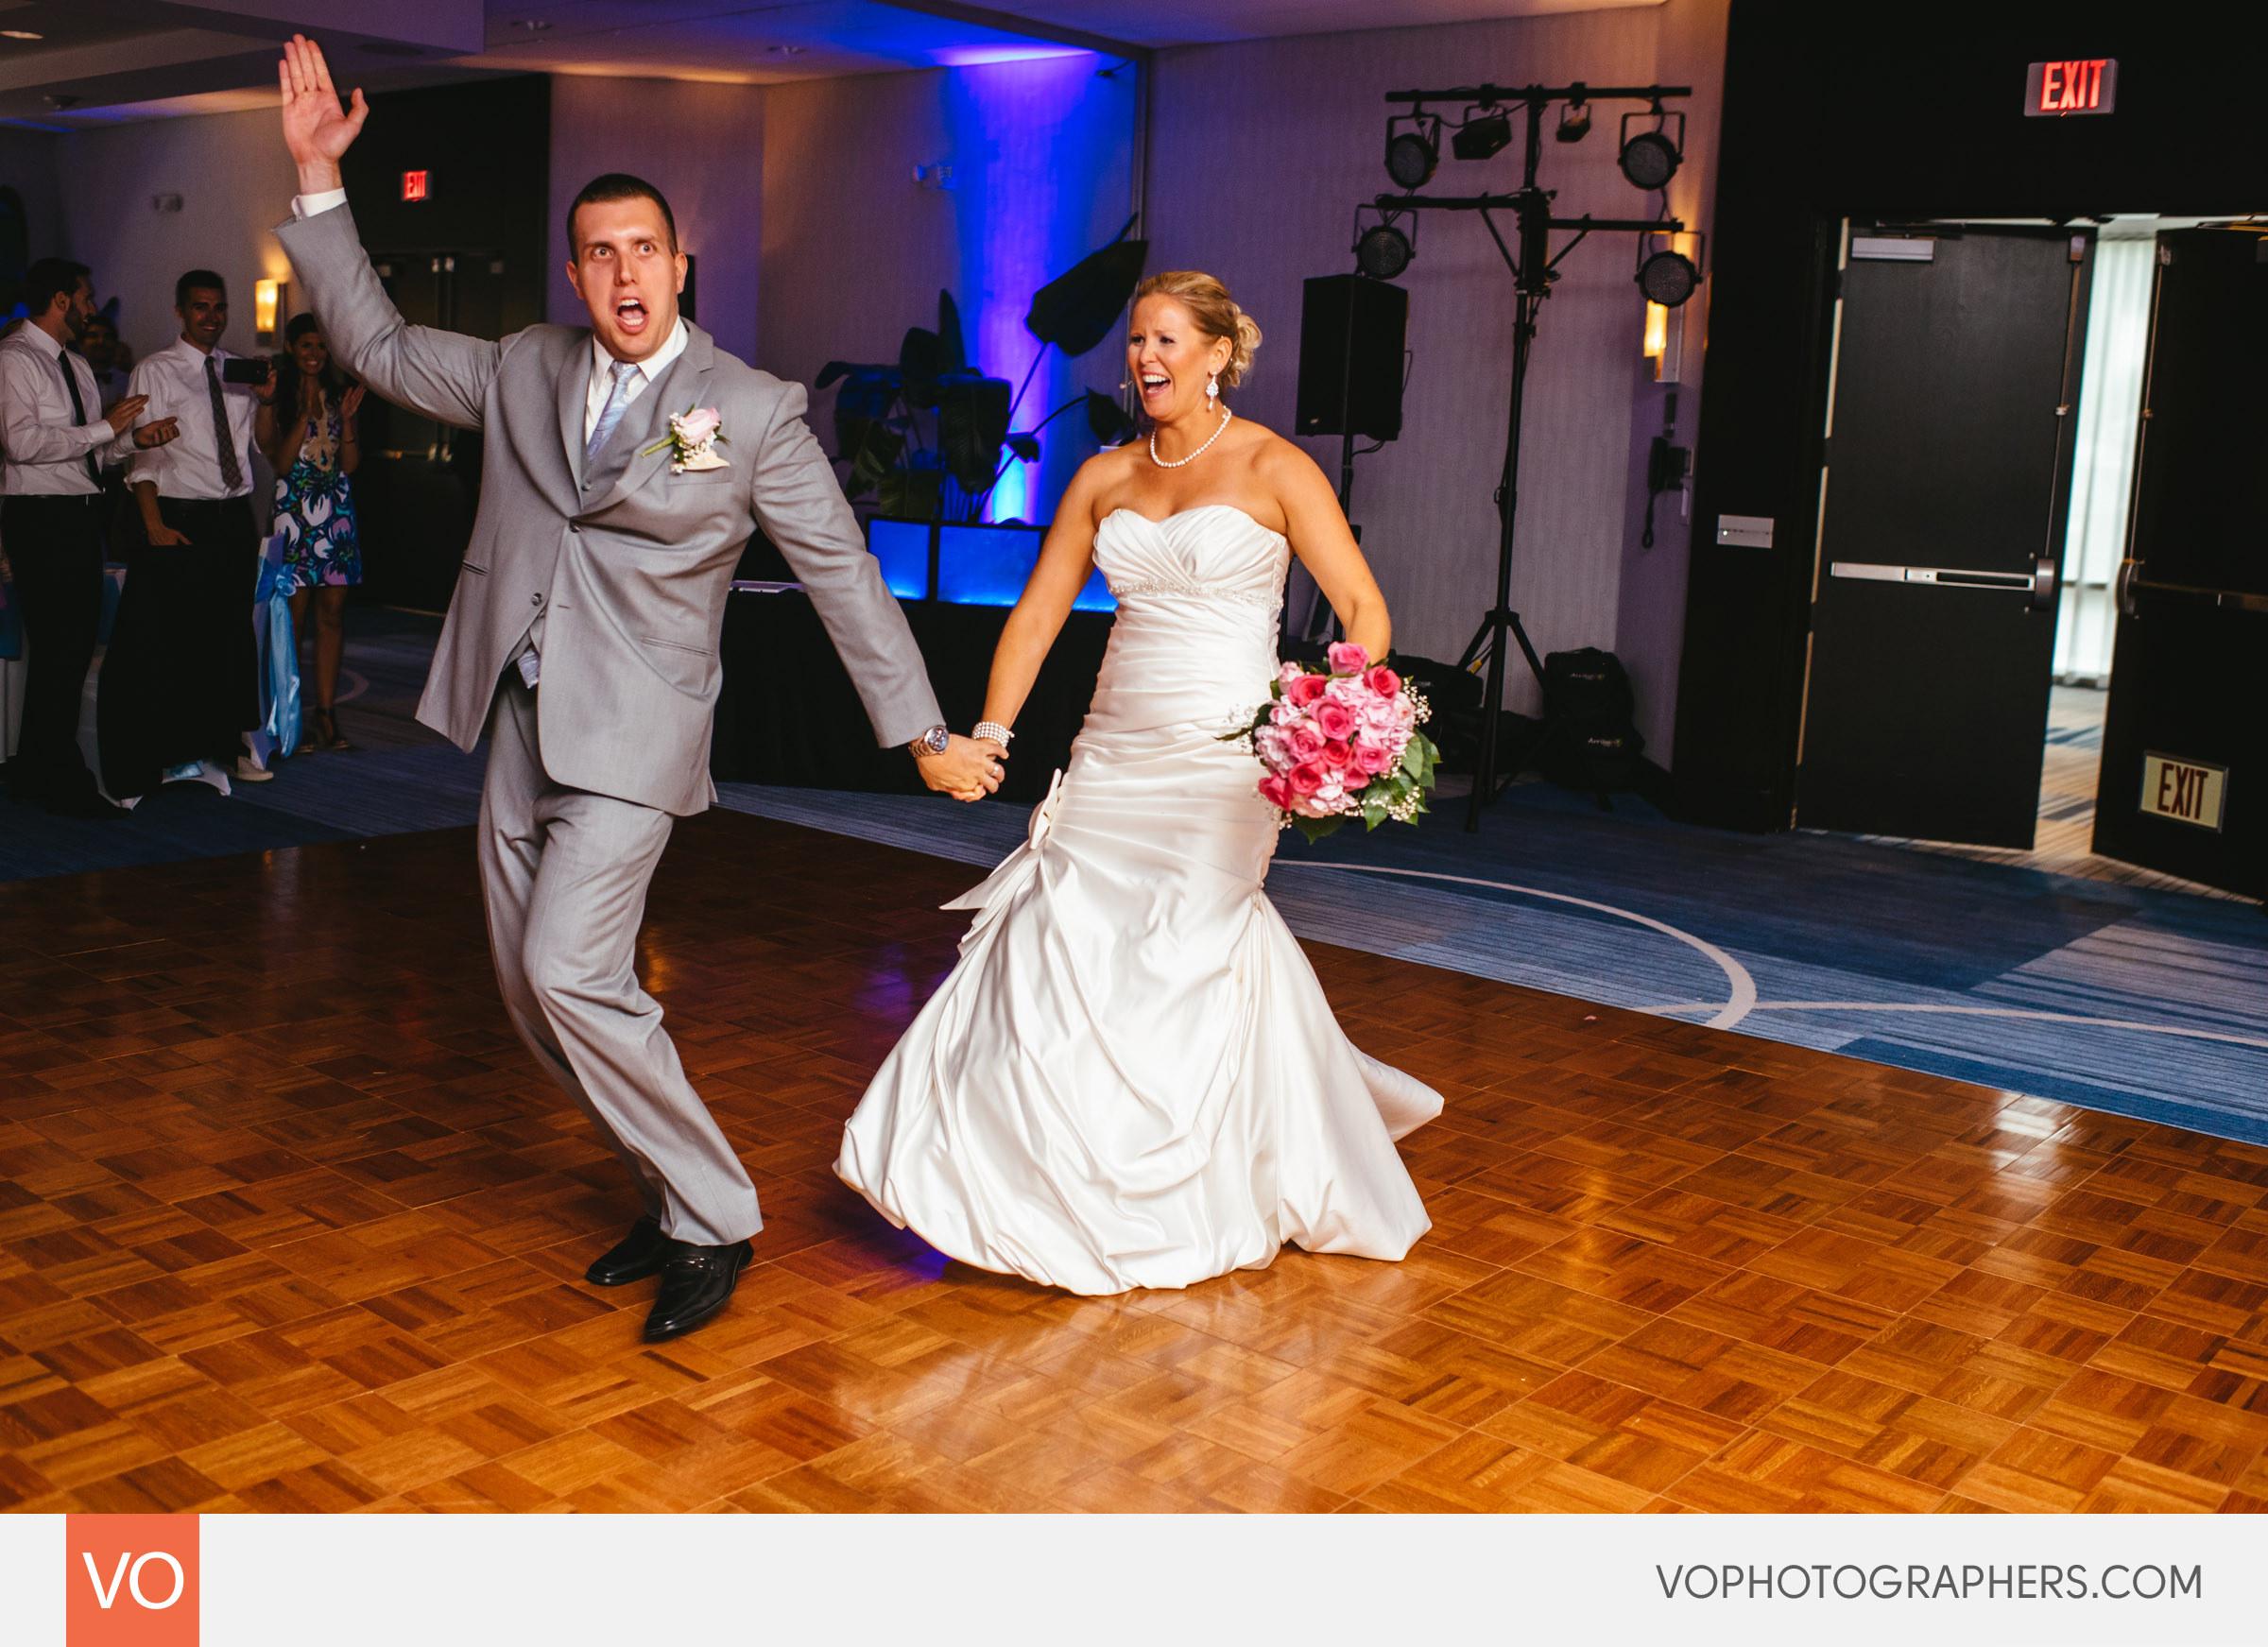 Doubletree-Hotel-Bristol-Wedding-Cathy-Chris-0031